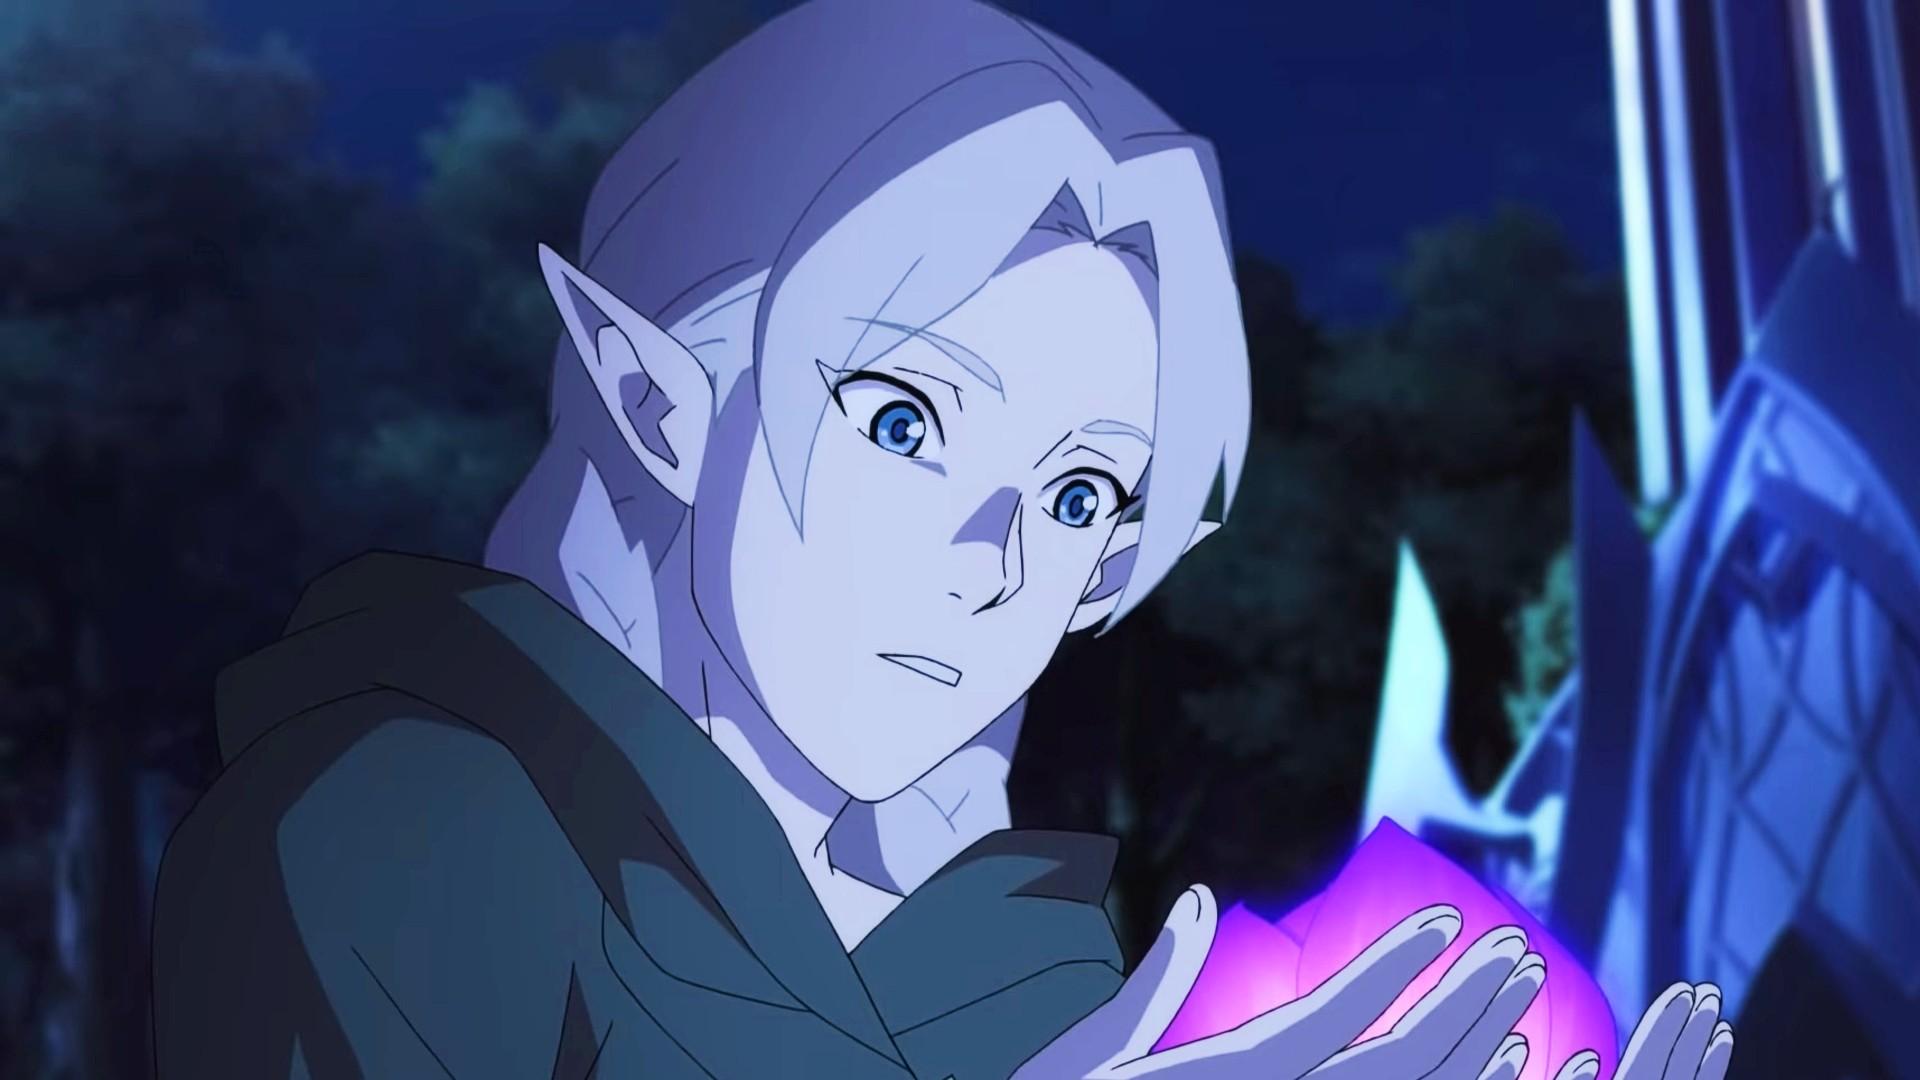 Dota 2 fans find secret trailer for the Dragon's Blood Netflix anime